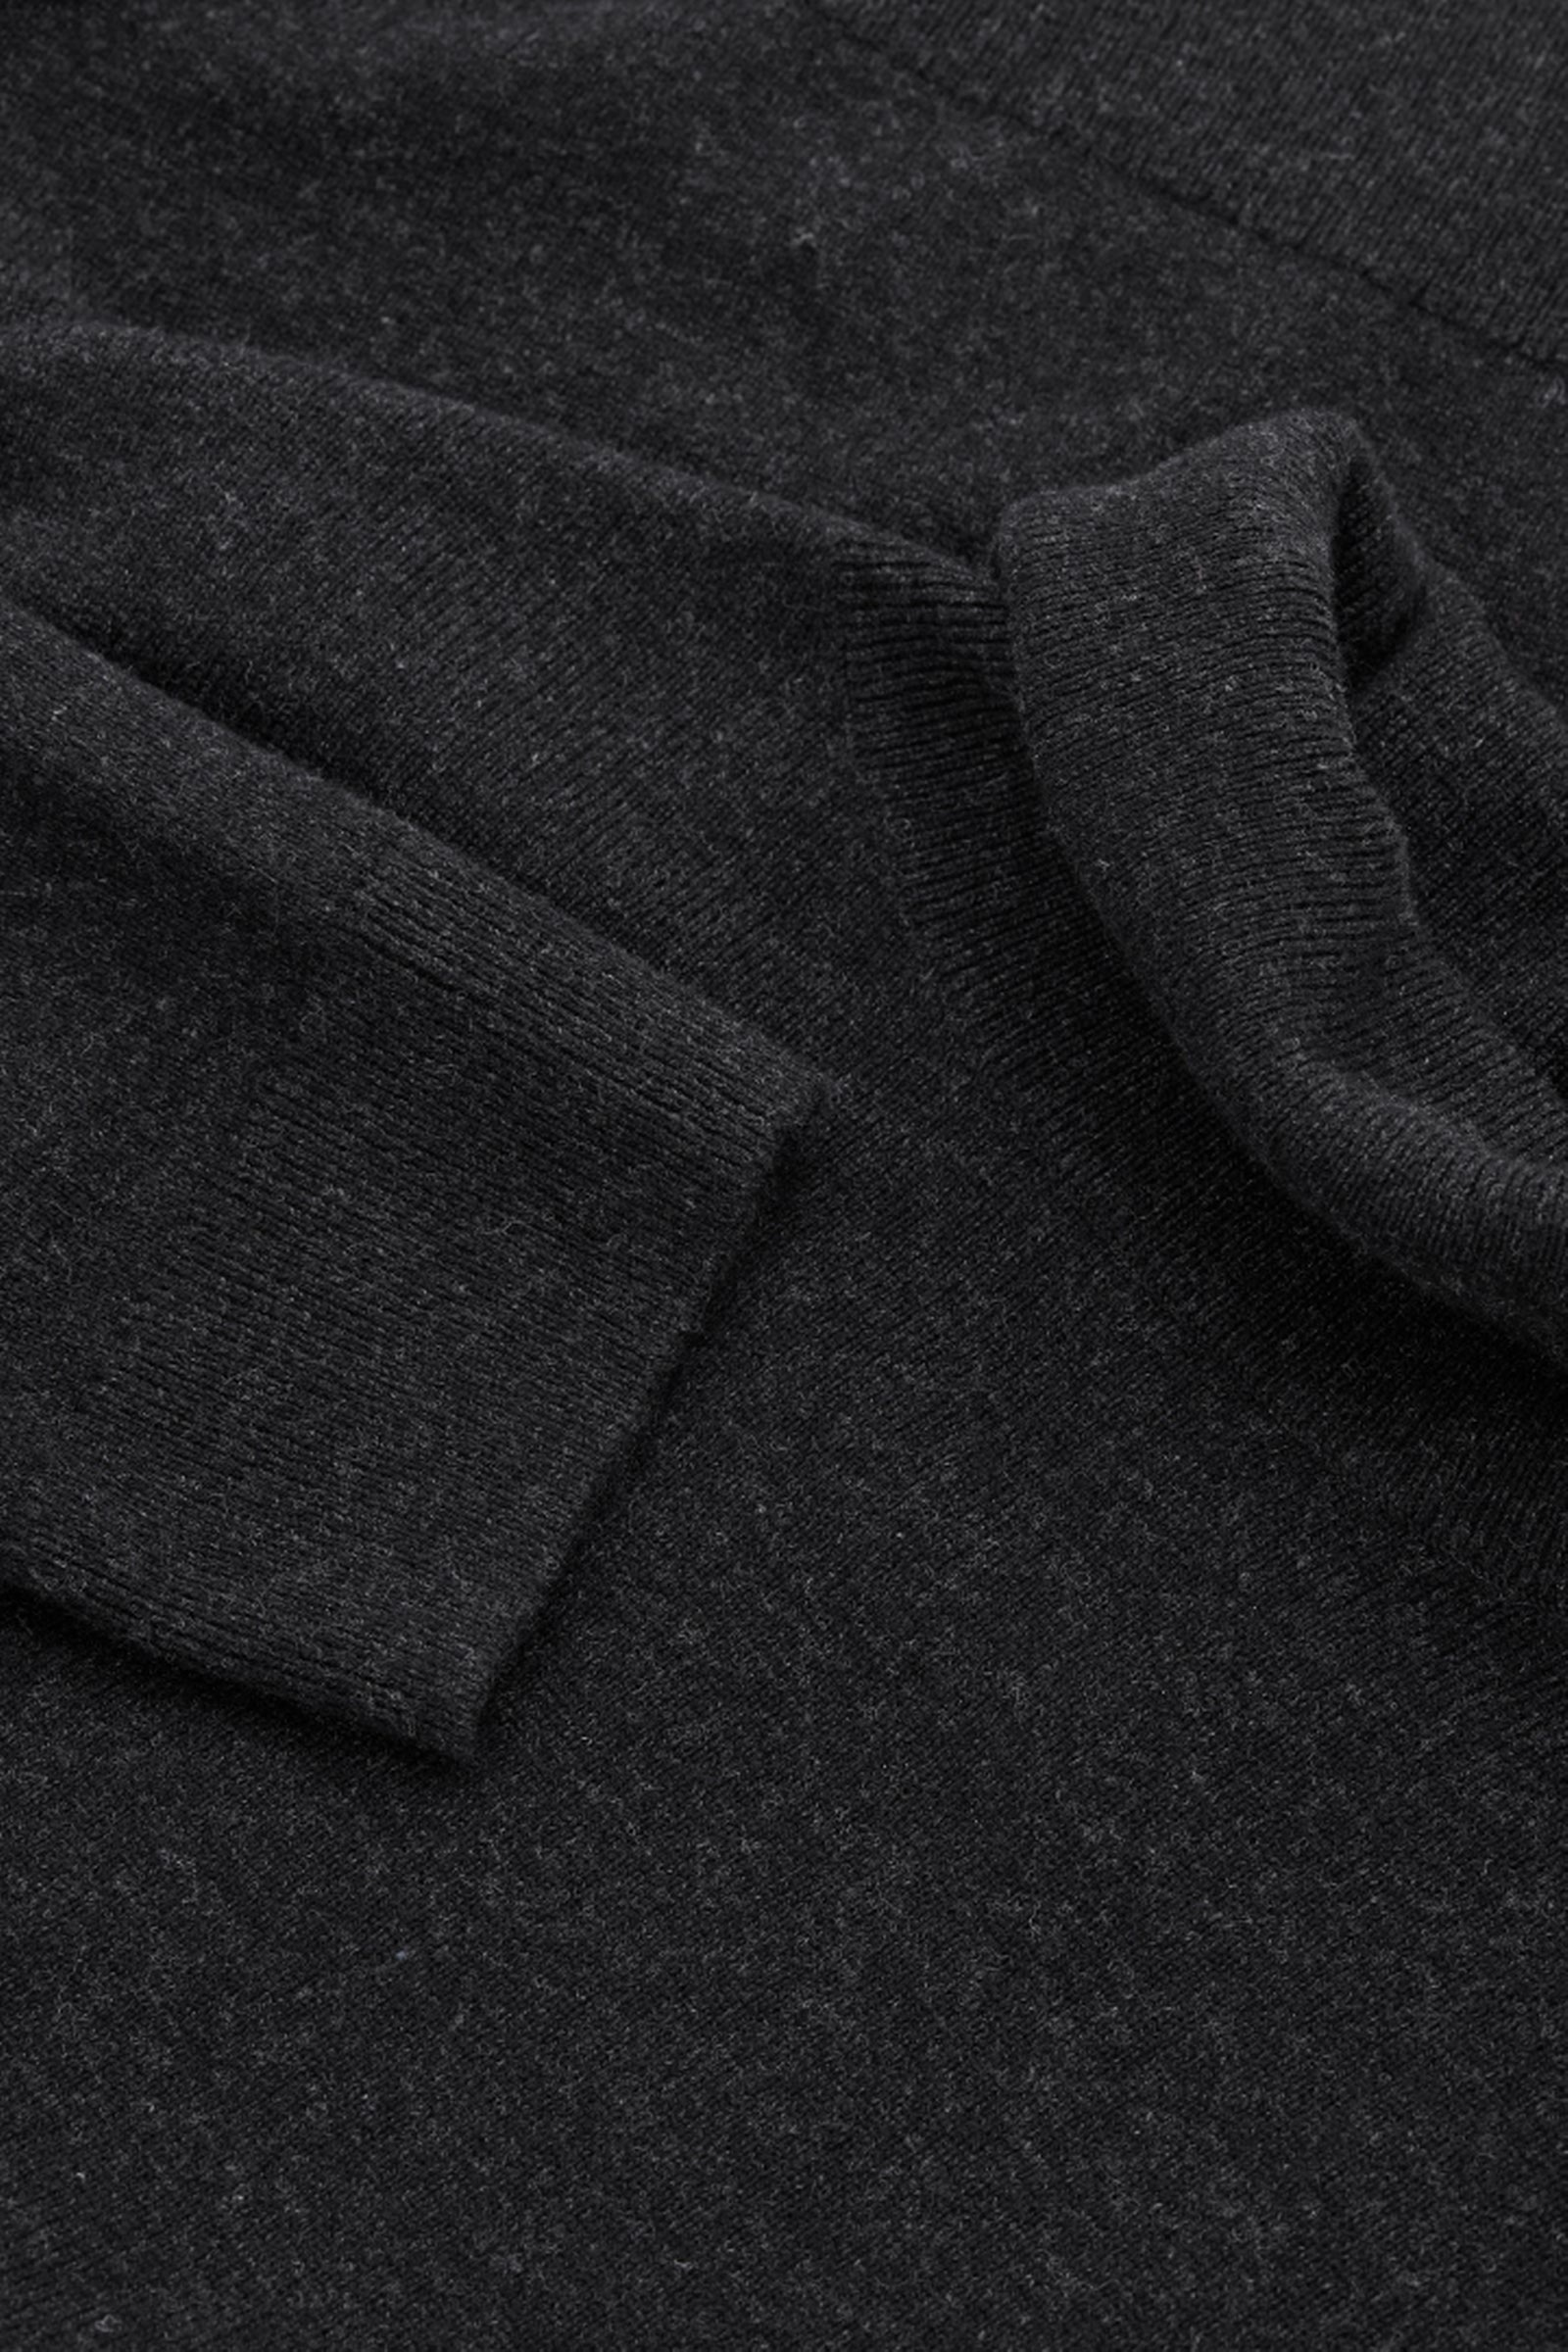 COS 메리노 야크 롤넥 스웨터의 블랙 멜란지컬러 Product입니다.